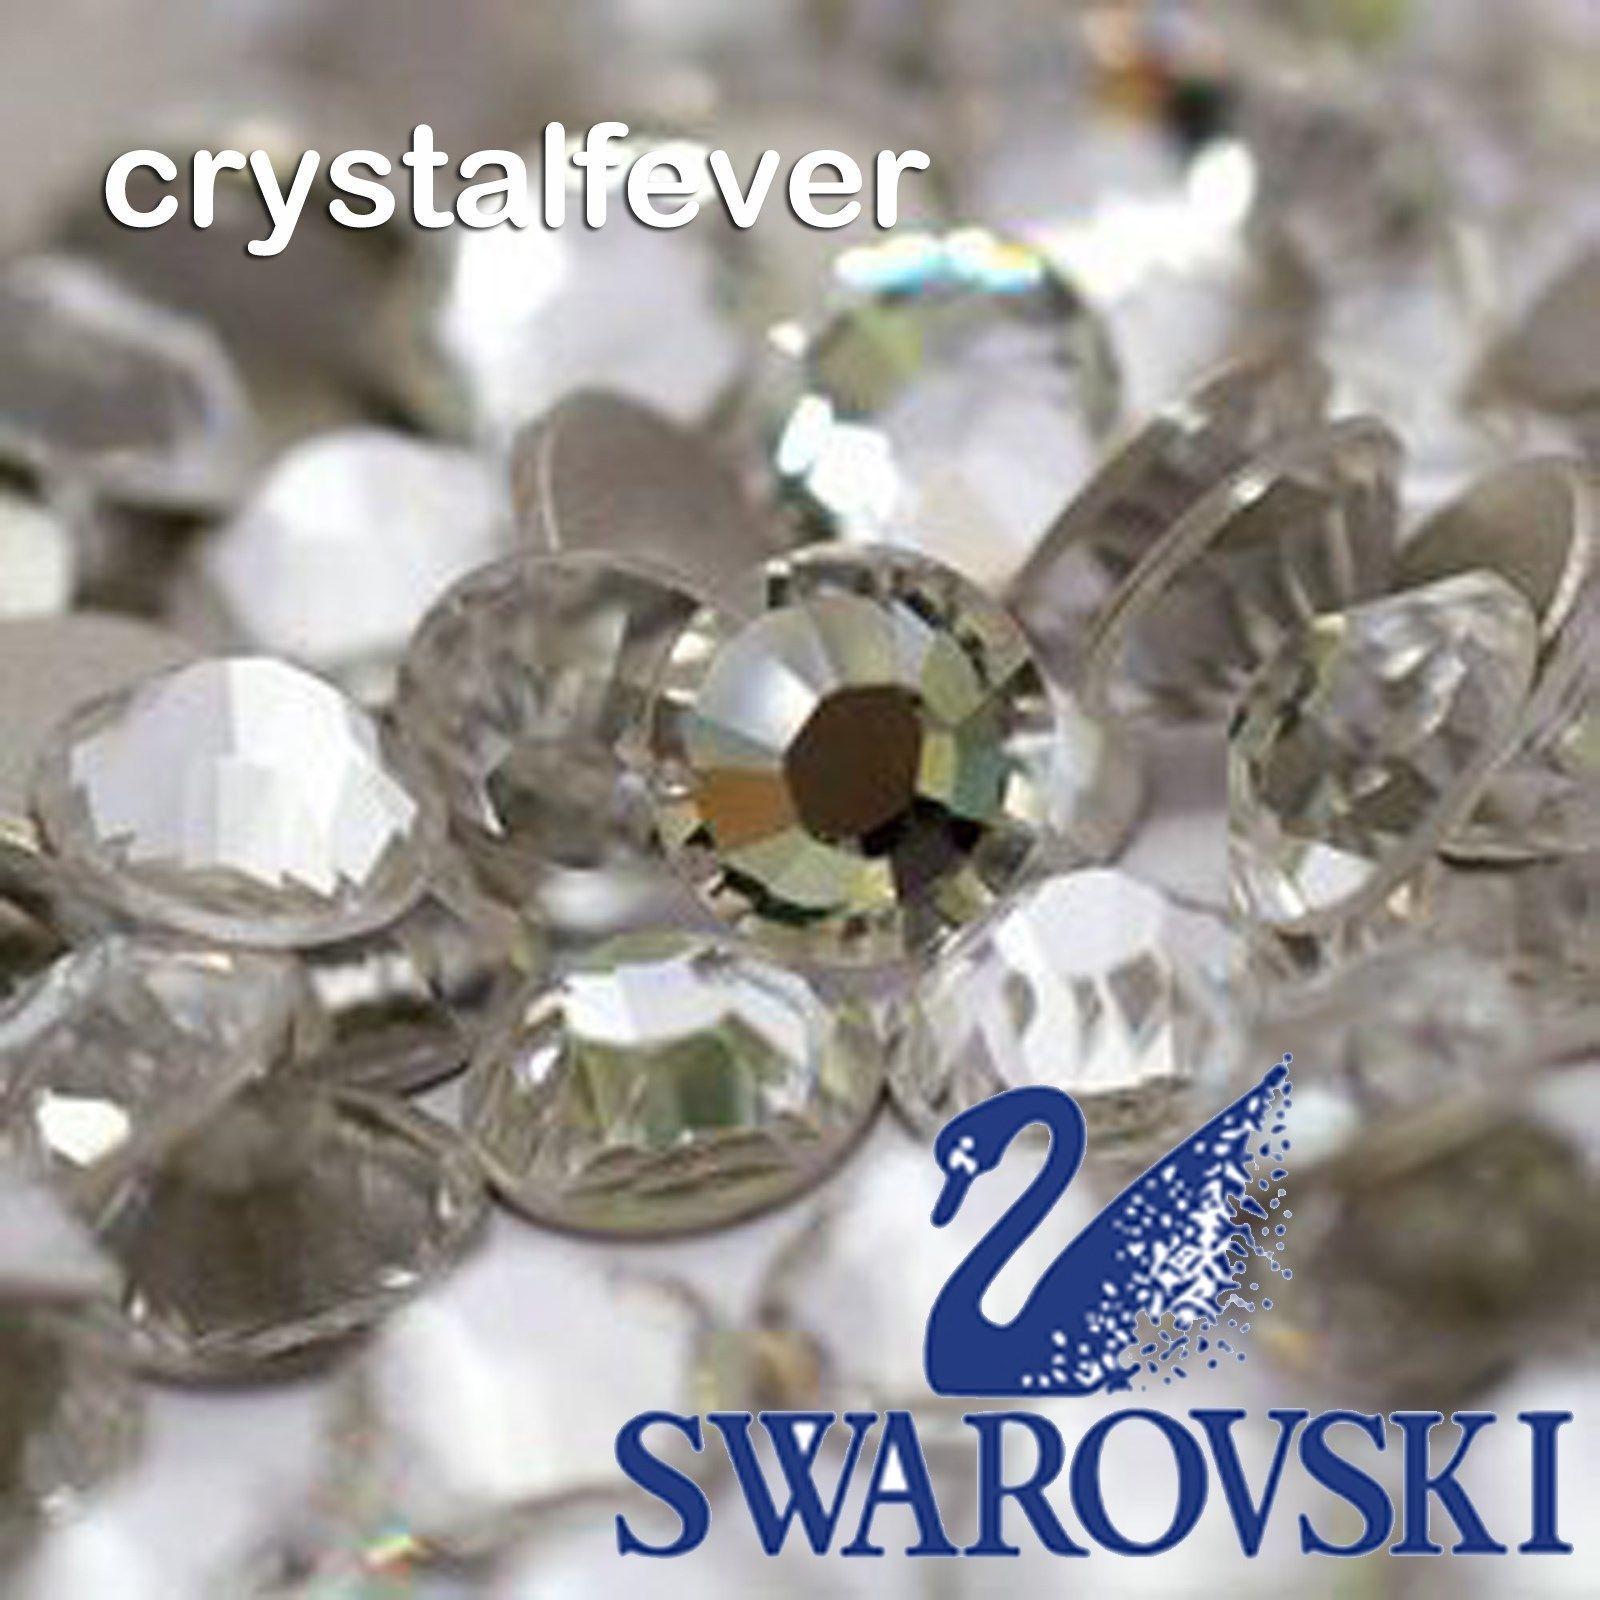 10Pcs 2058 Swarovski Clear Crystals SS40 / SS48 Non Hotfix Flatback Rhinestones